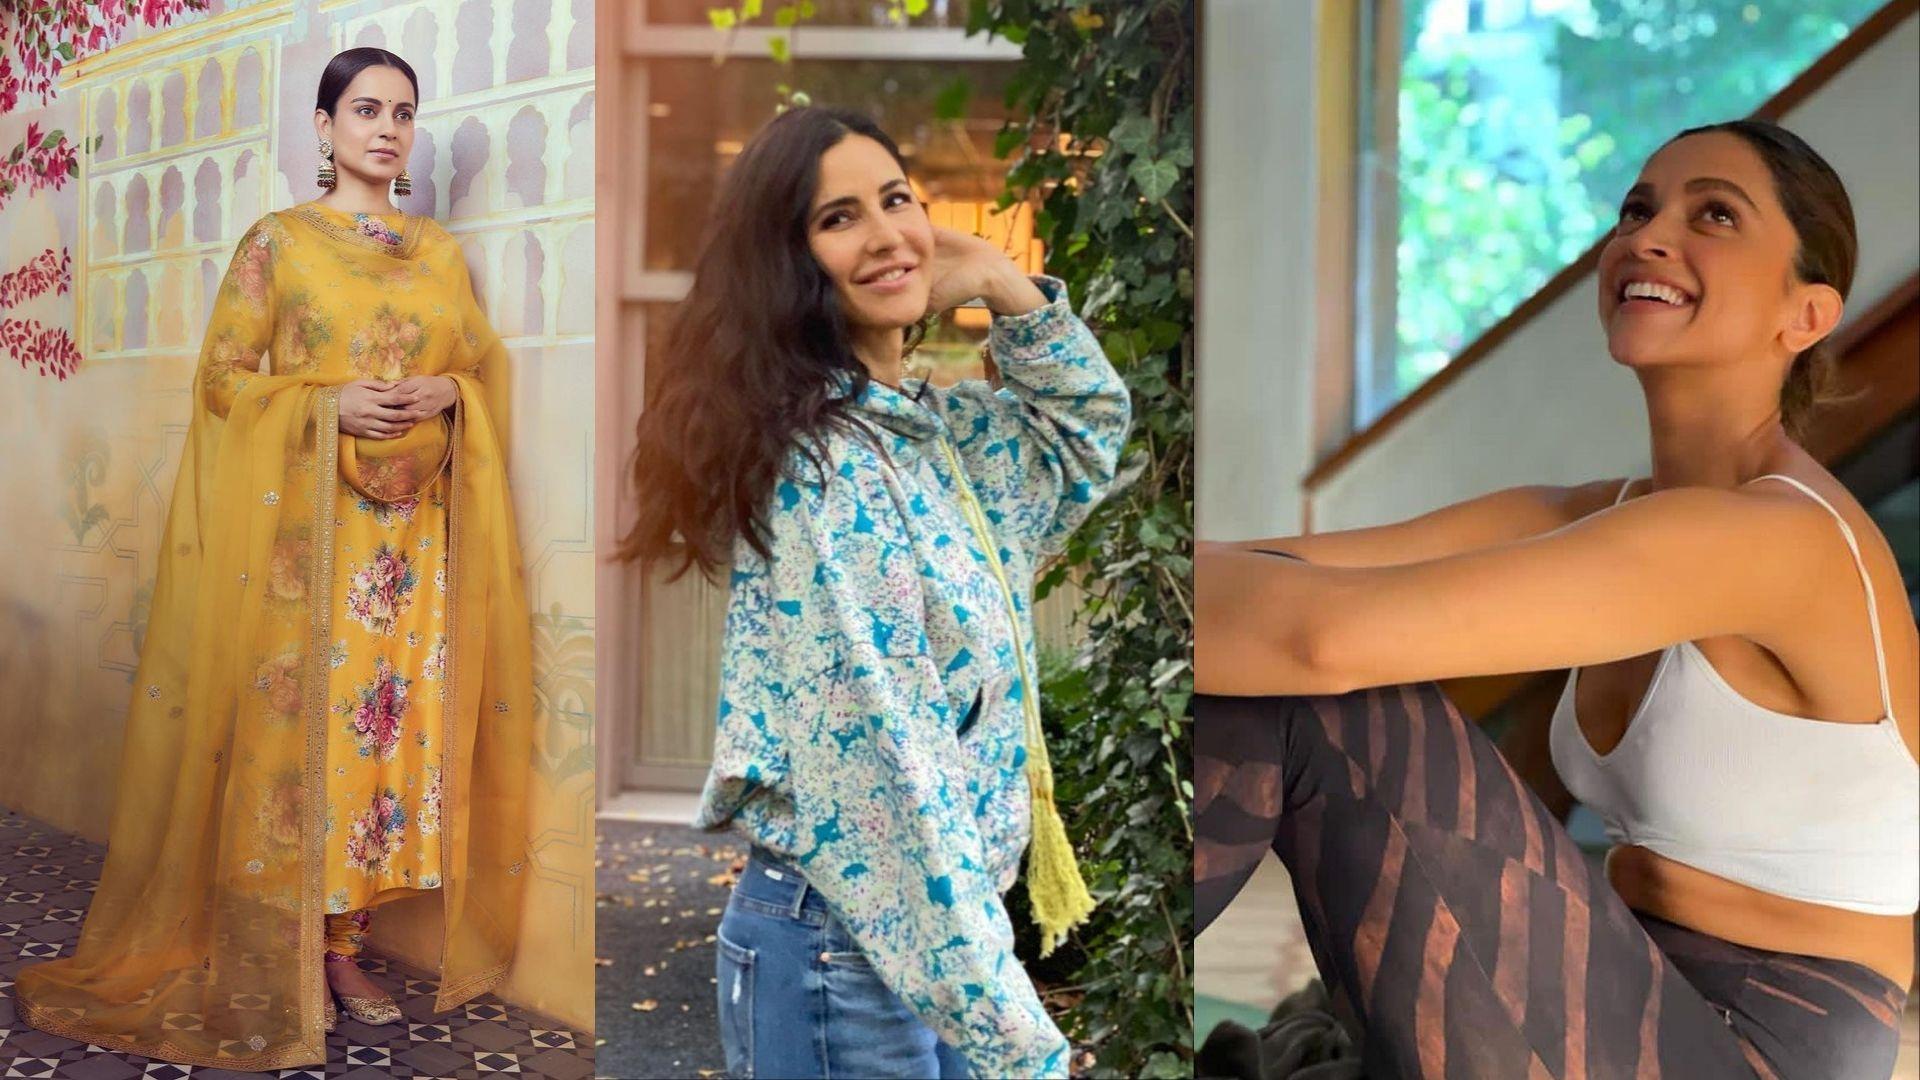 Kangana Ranaut, Deepika Padukone, Katrina Kaif- Top 5 Bollywood Actresses Who Gave Most Hit Films